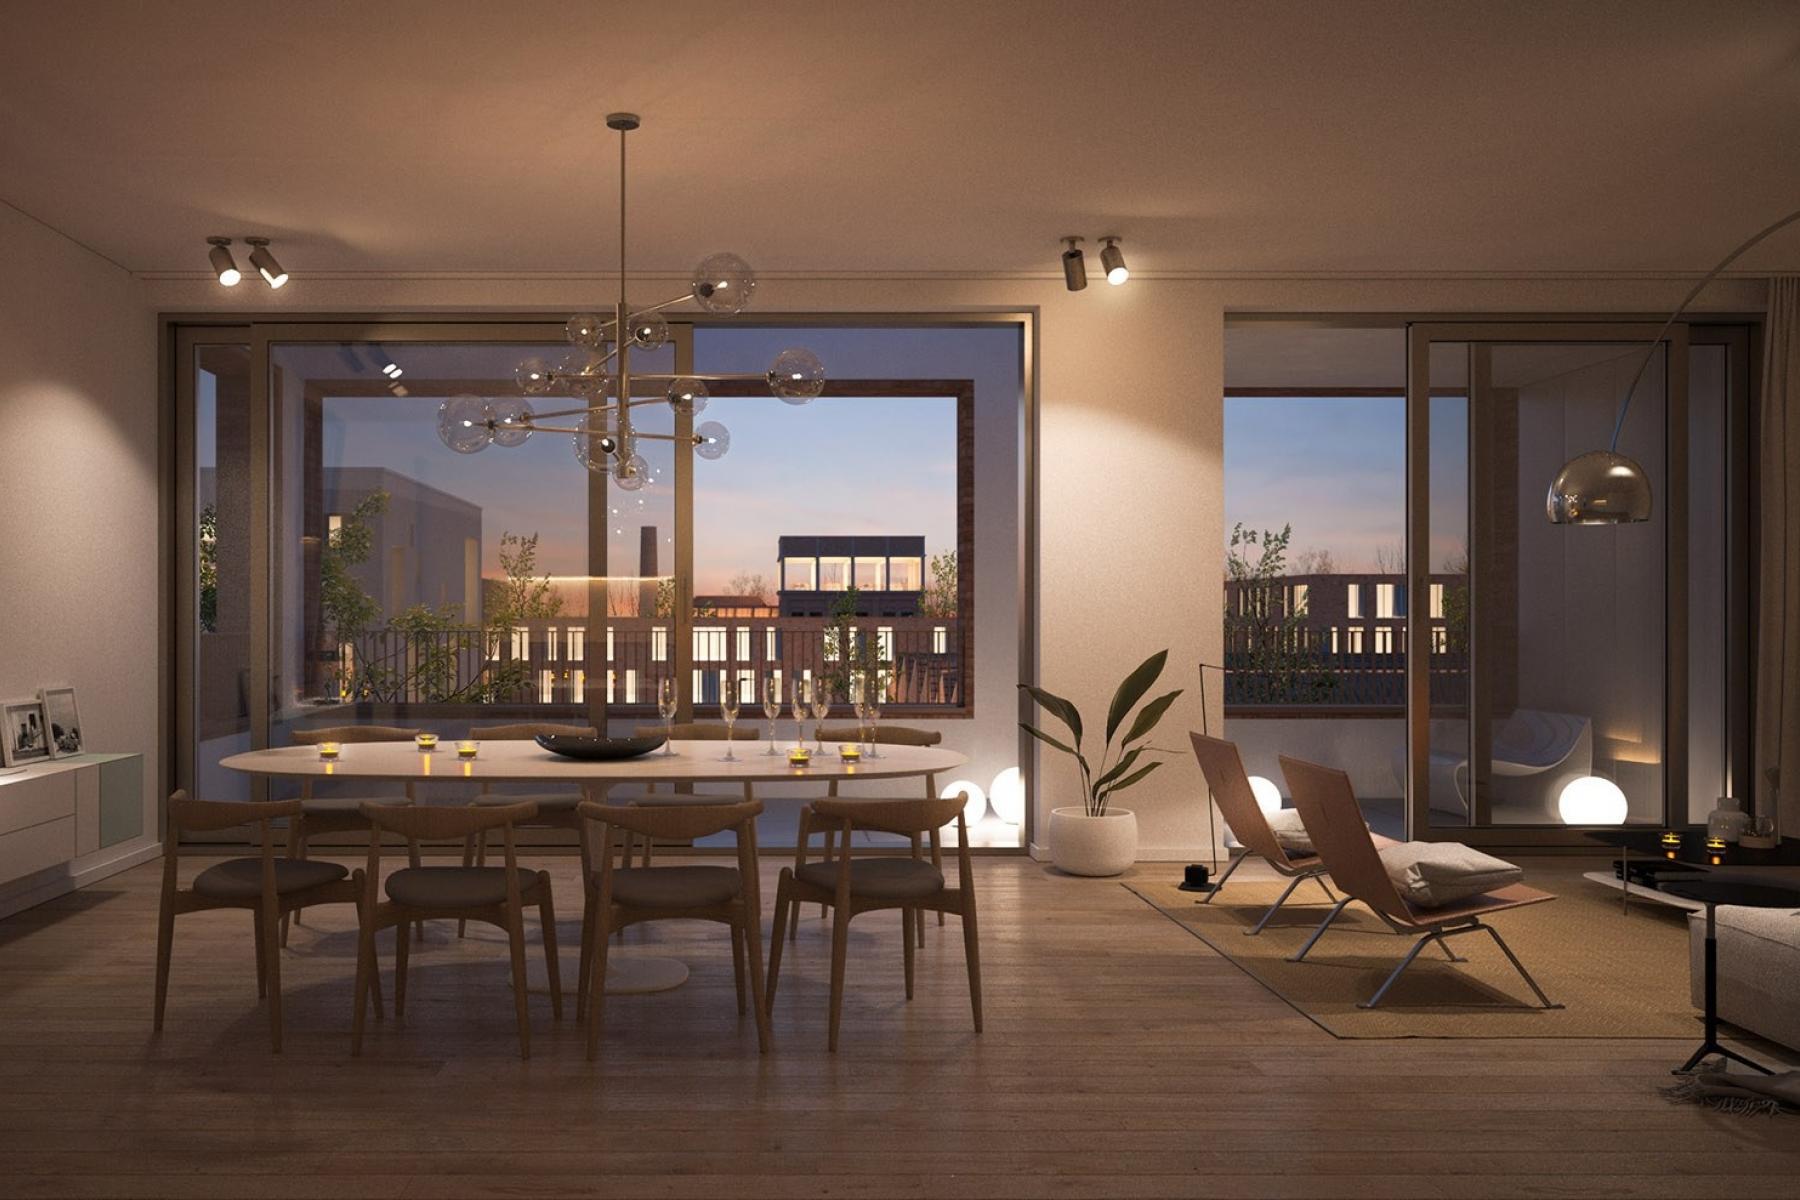 Penthouse Appartementen te koop in Oudenaarde